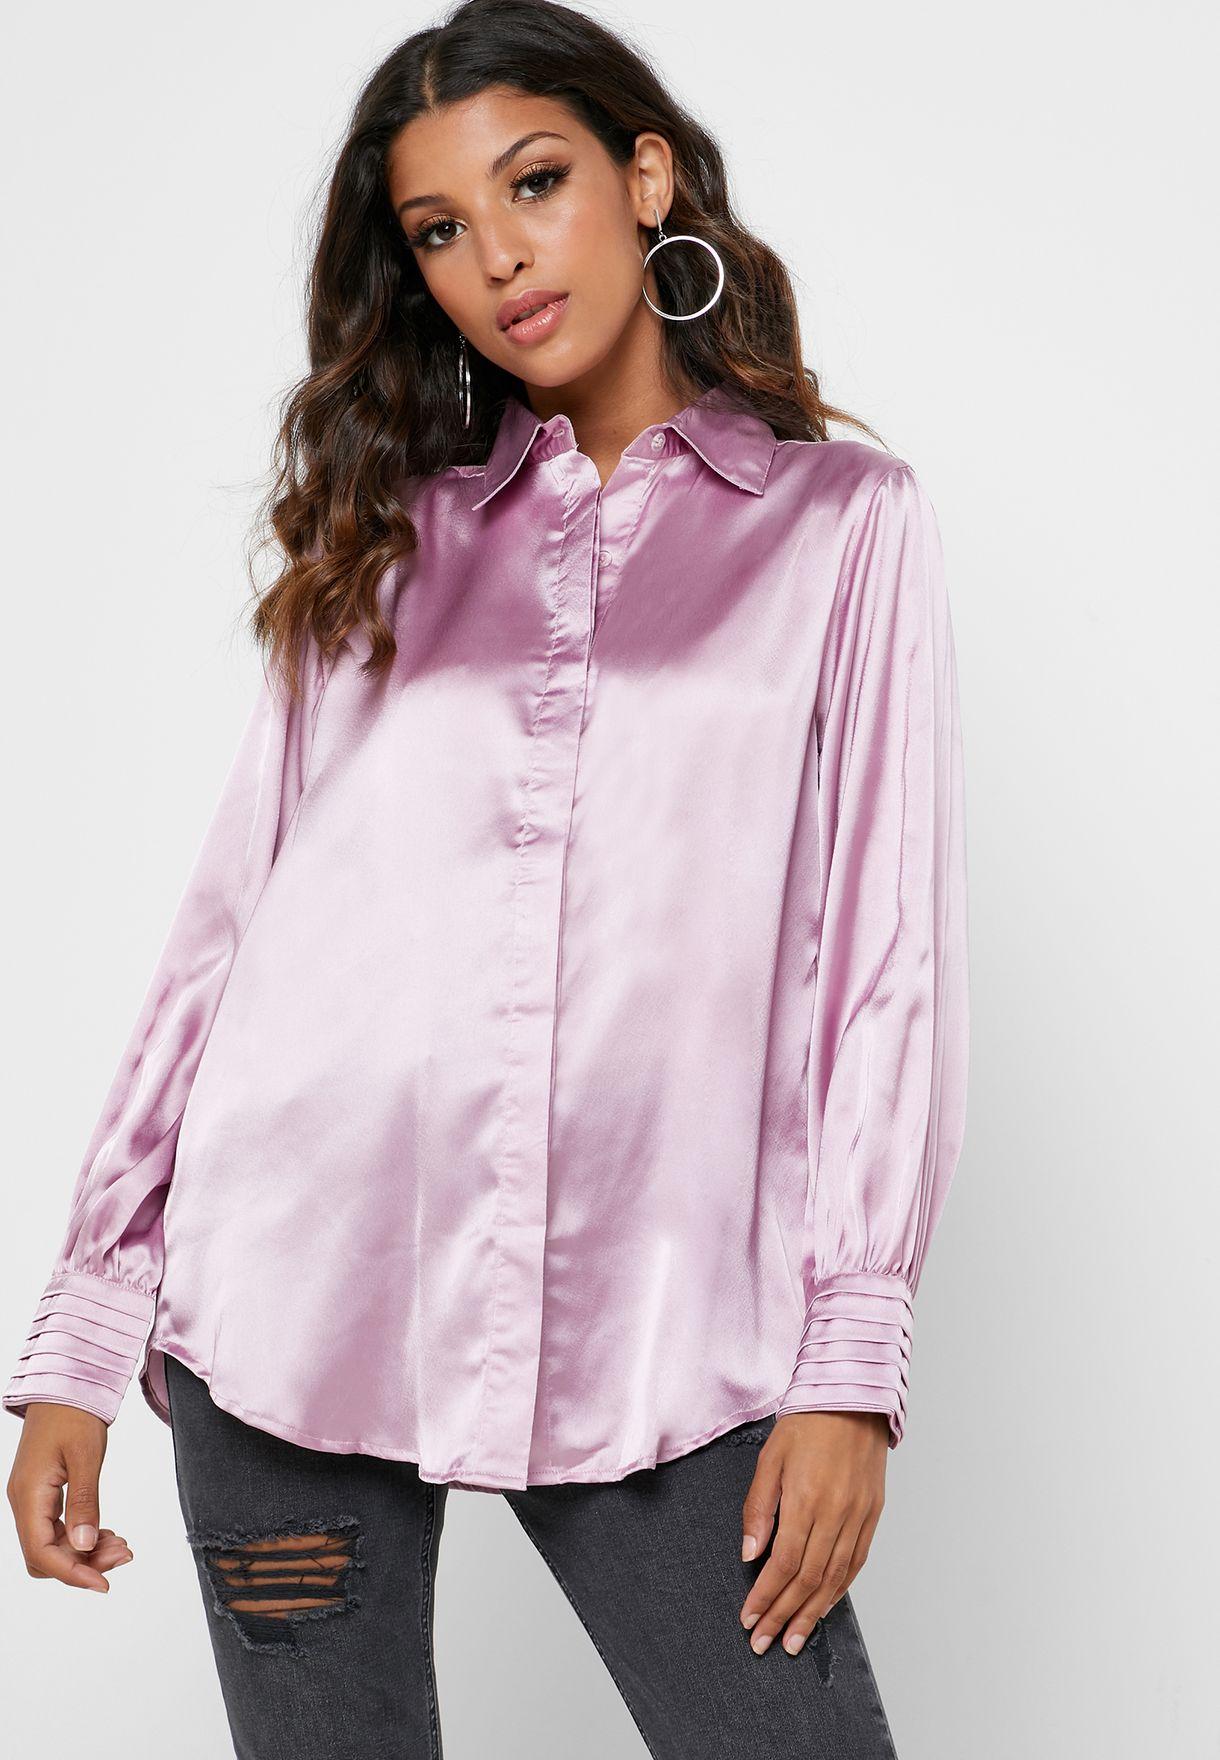 قميص مزين بازرار